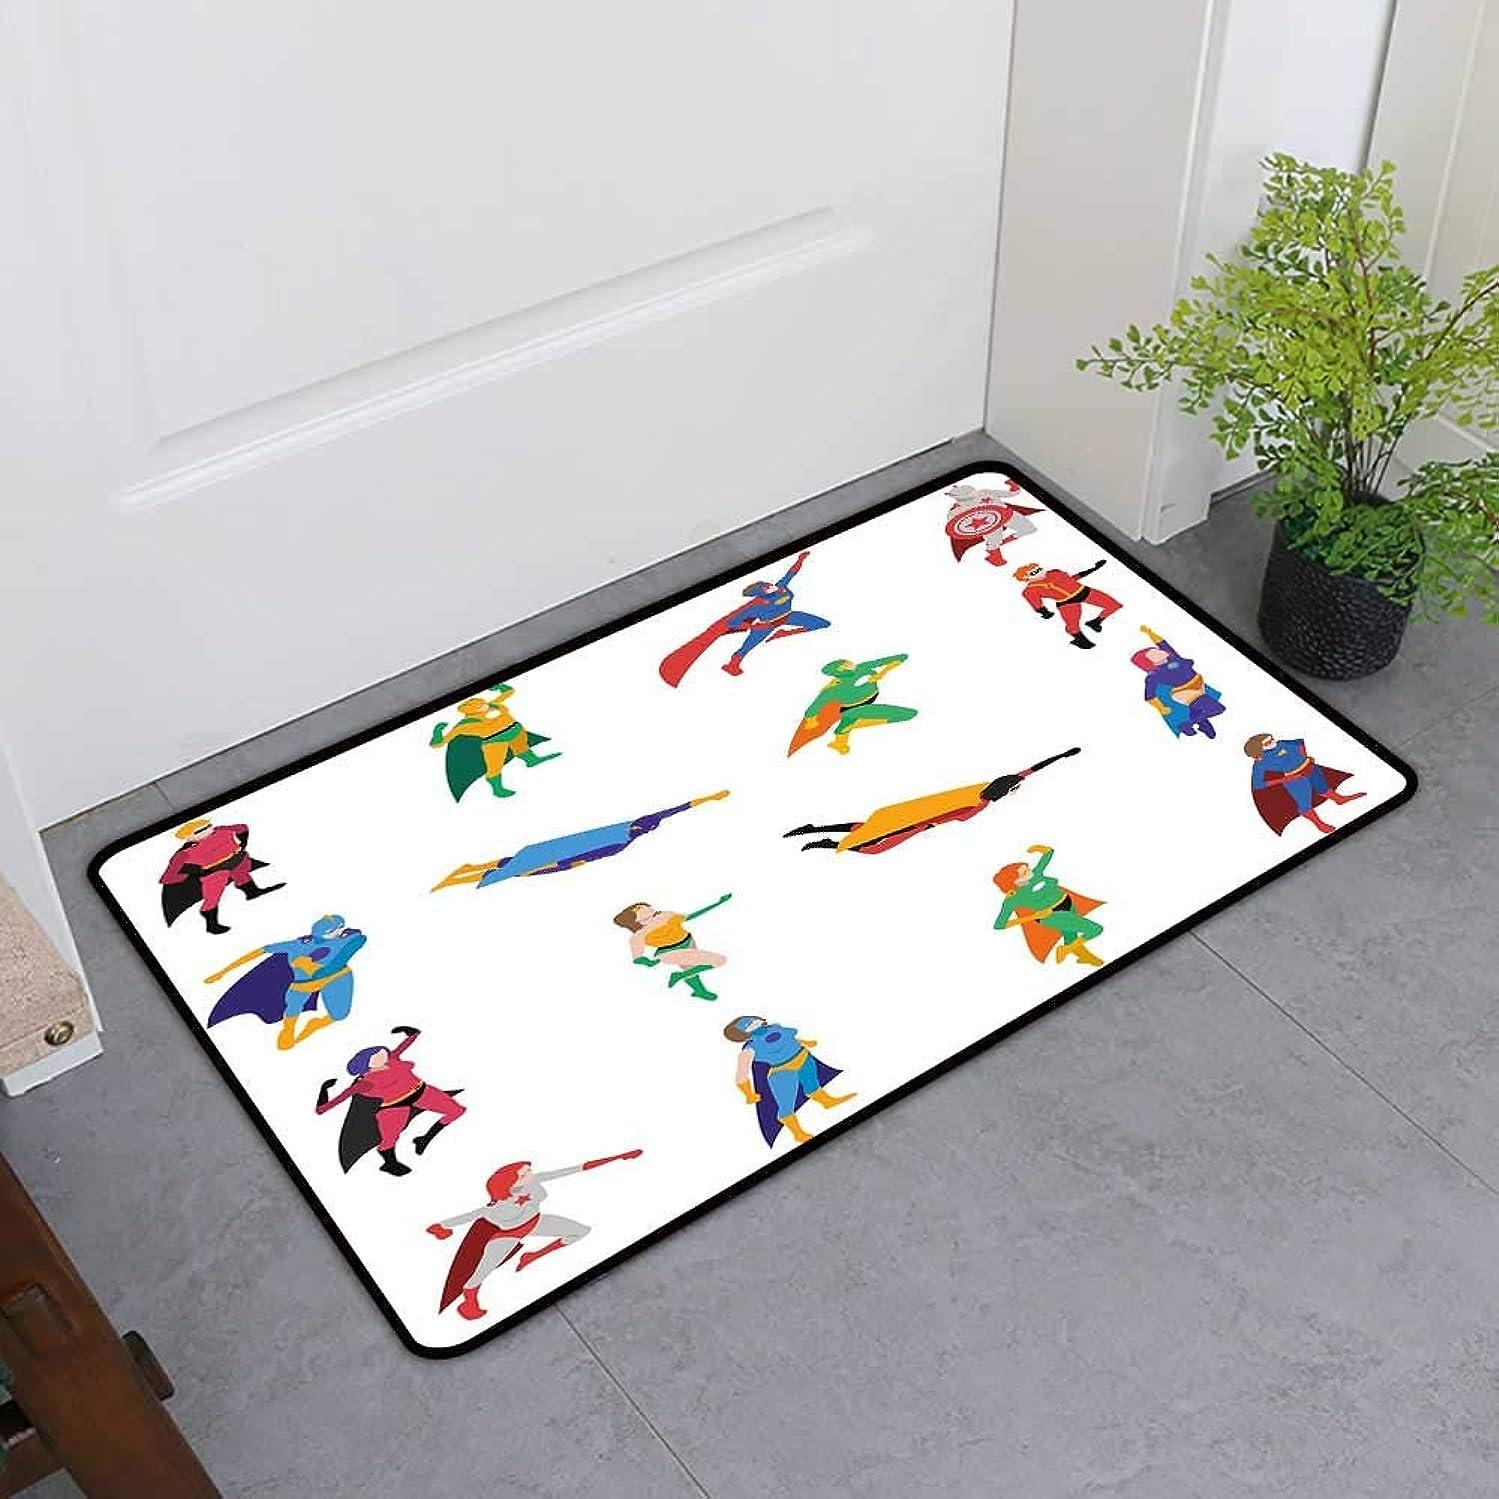 Entrance Door Mat, Superhero Custom Doormats for Bedroom, Heroic Characters with Supernatural Powers Popular Strip Protector Icons Image (Multicolor, H24 x W36)